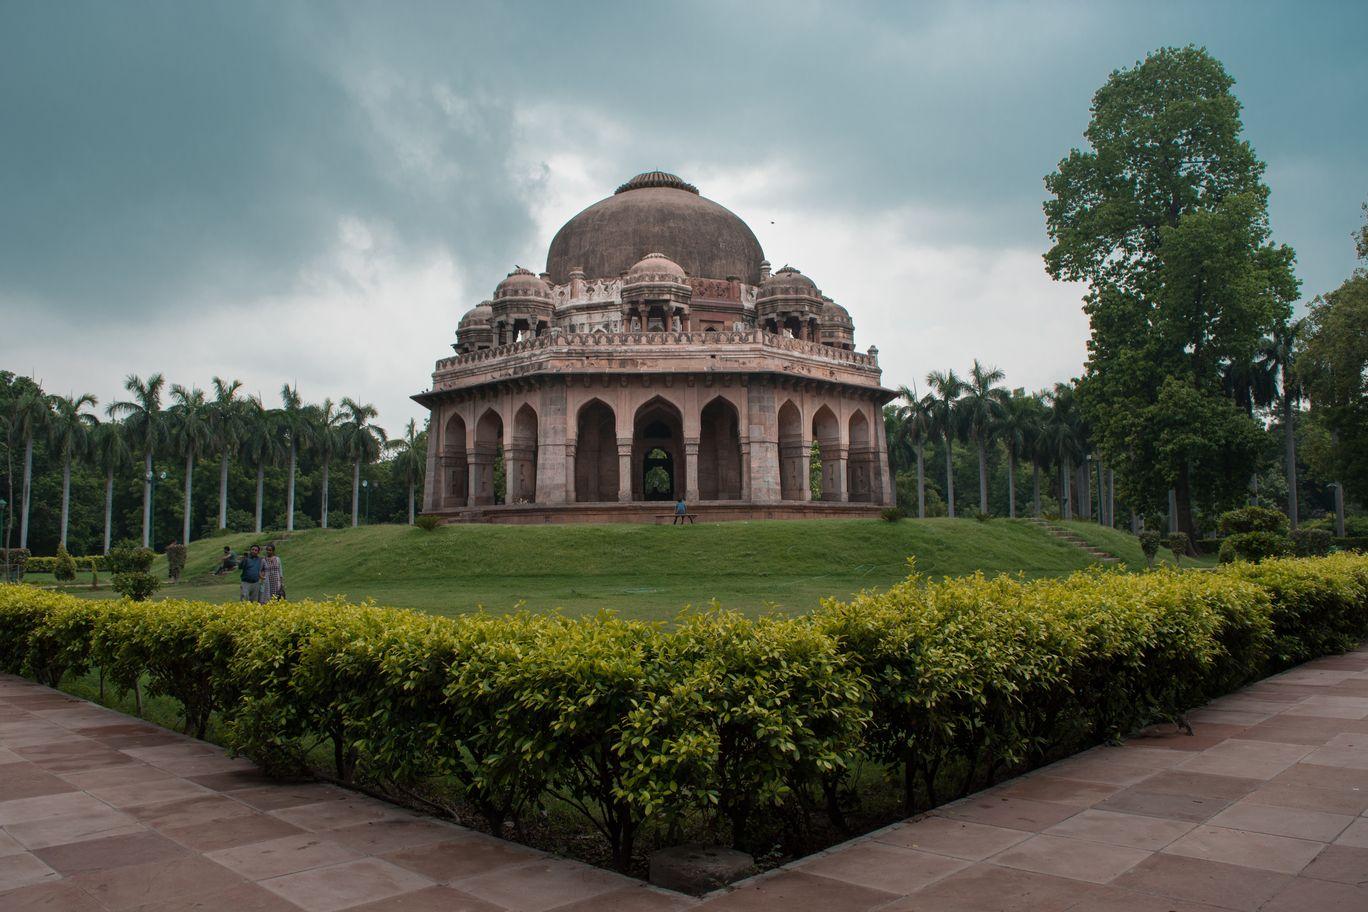 Photo of Lodhi Gardens By sachin chauhan